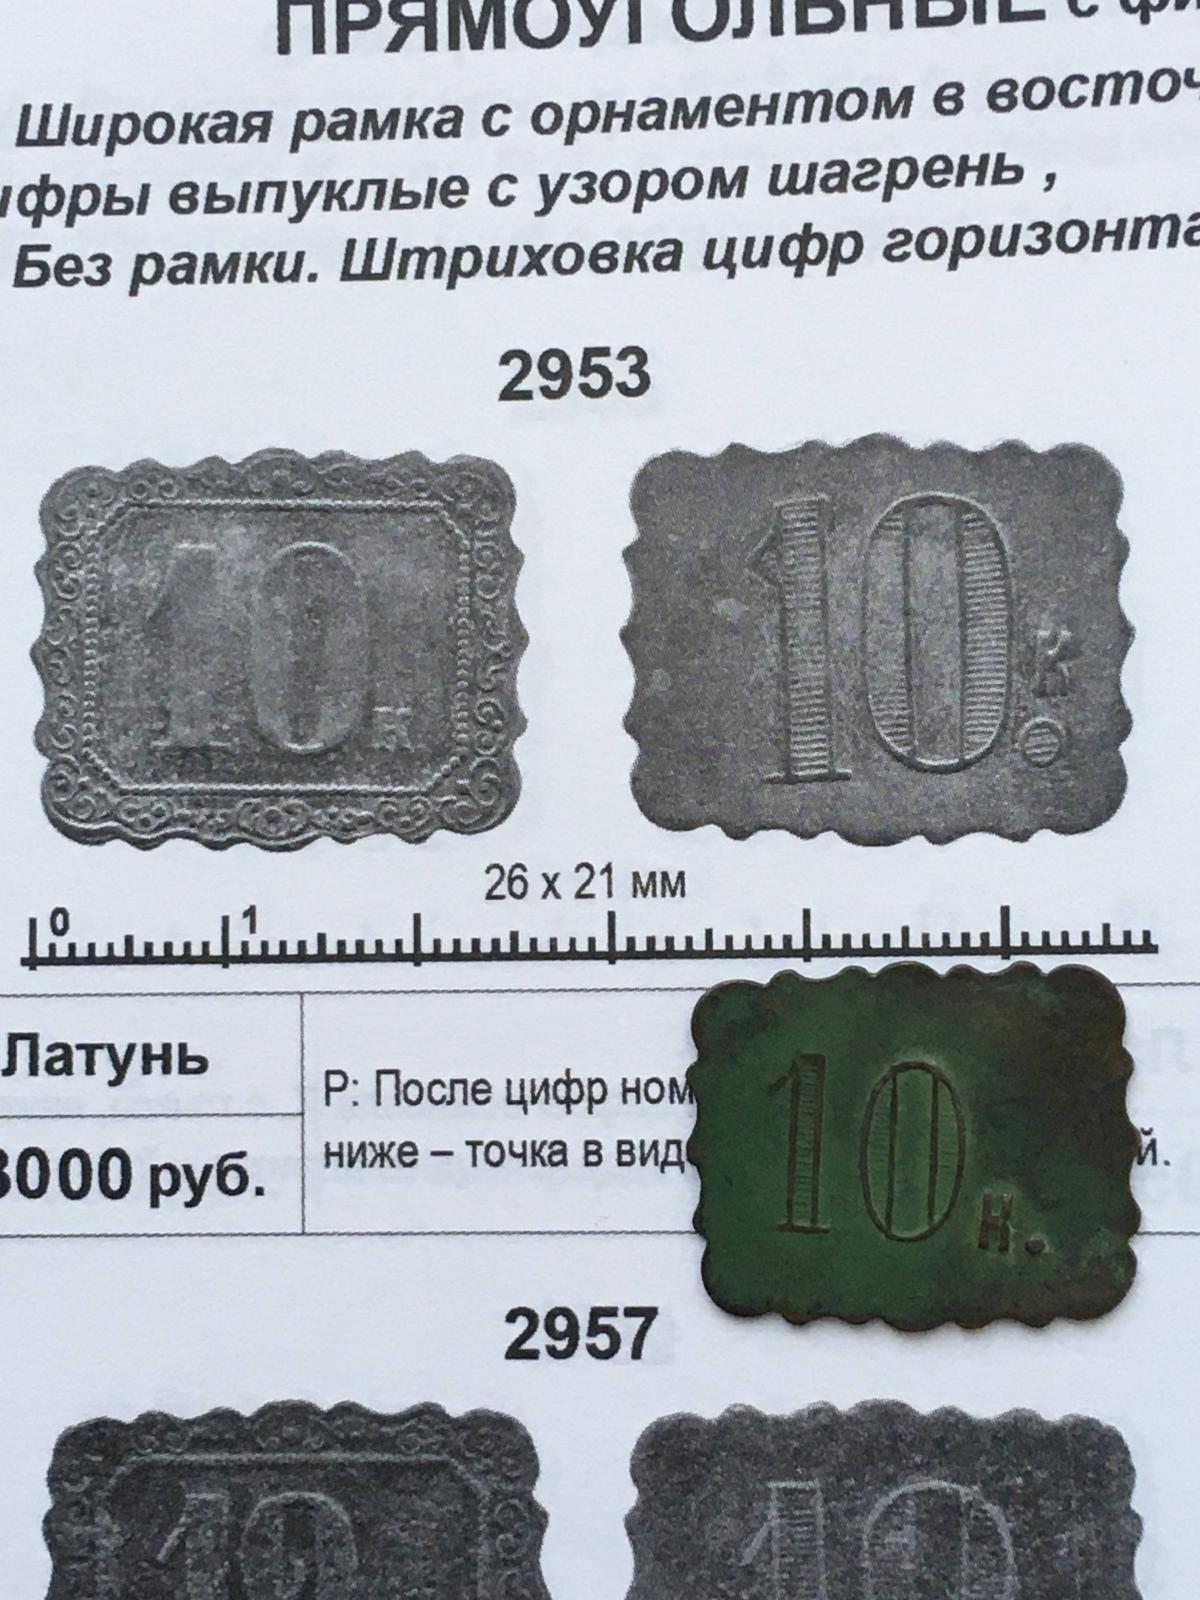 IMG-8500.JPG